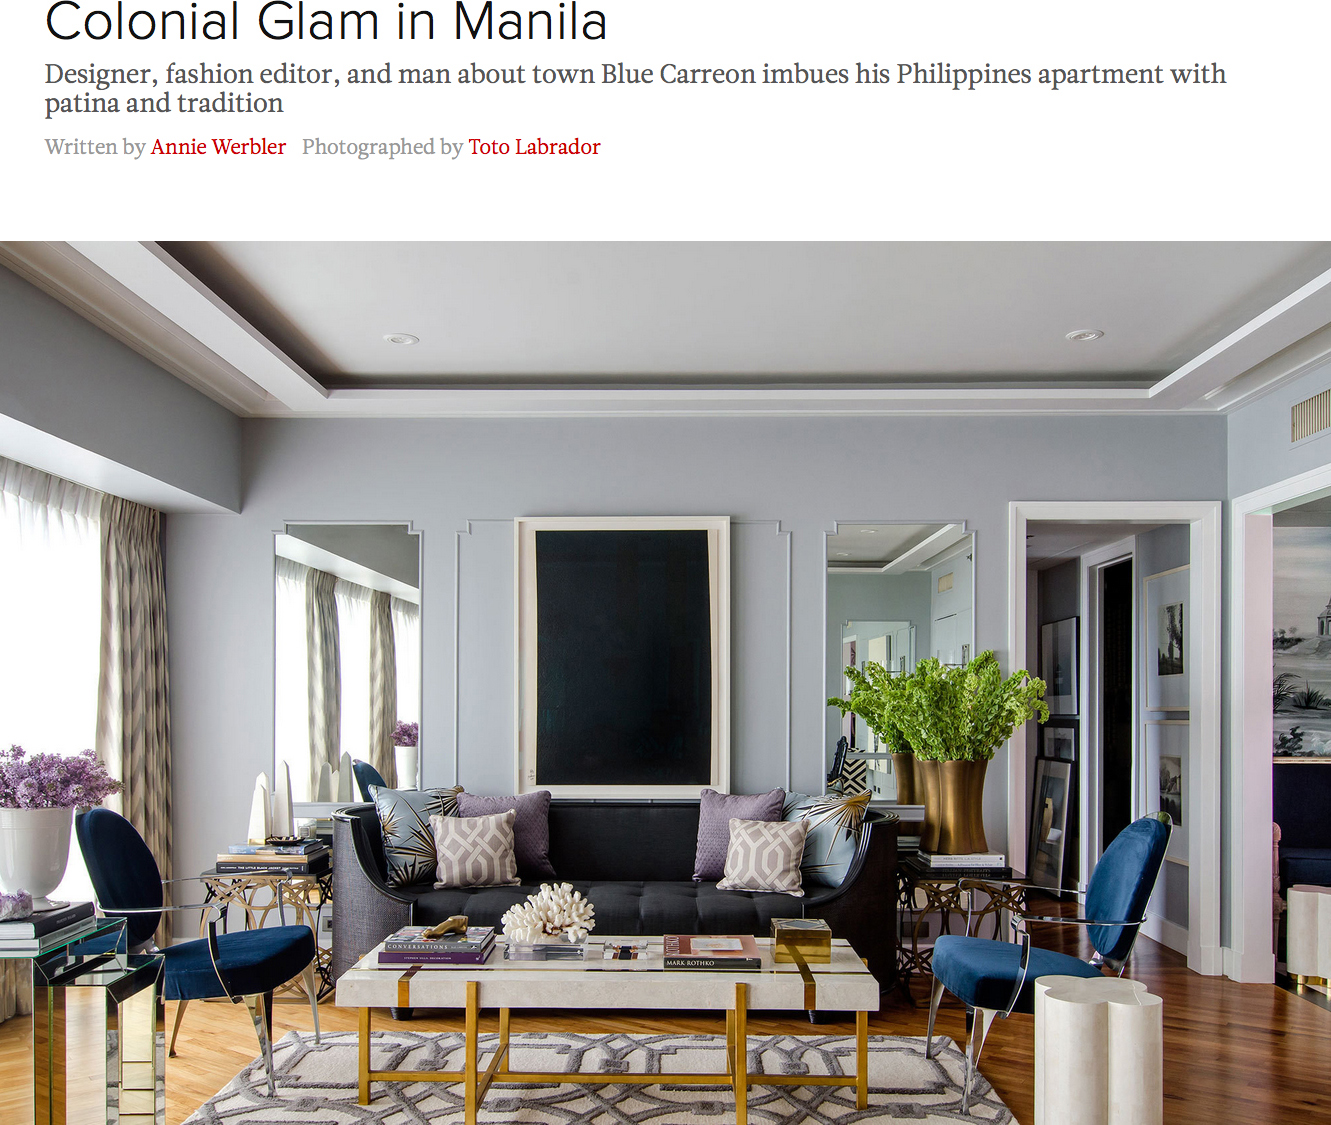 Colonial Glam in Manila